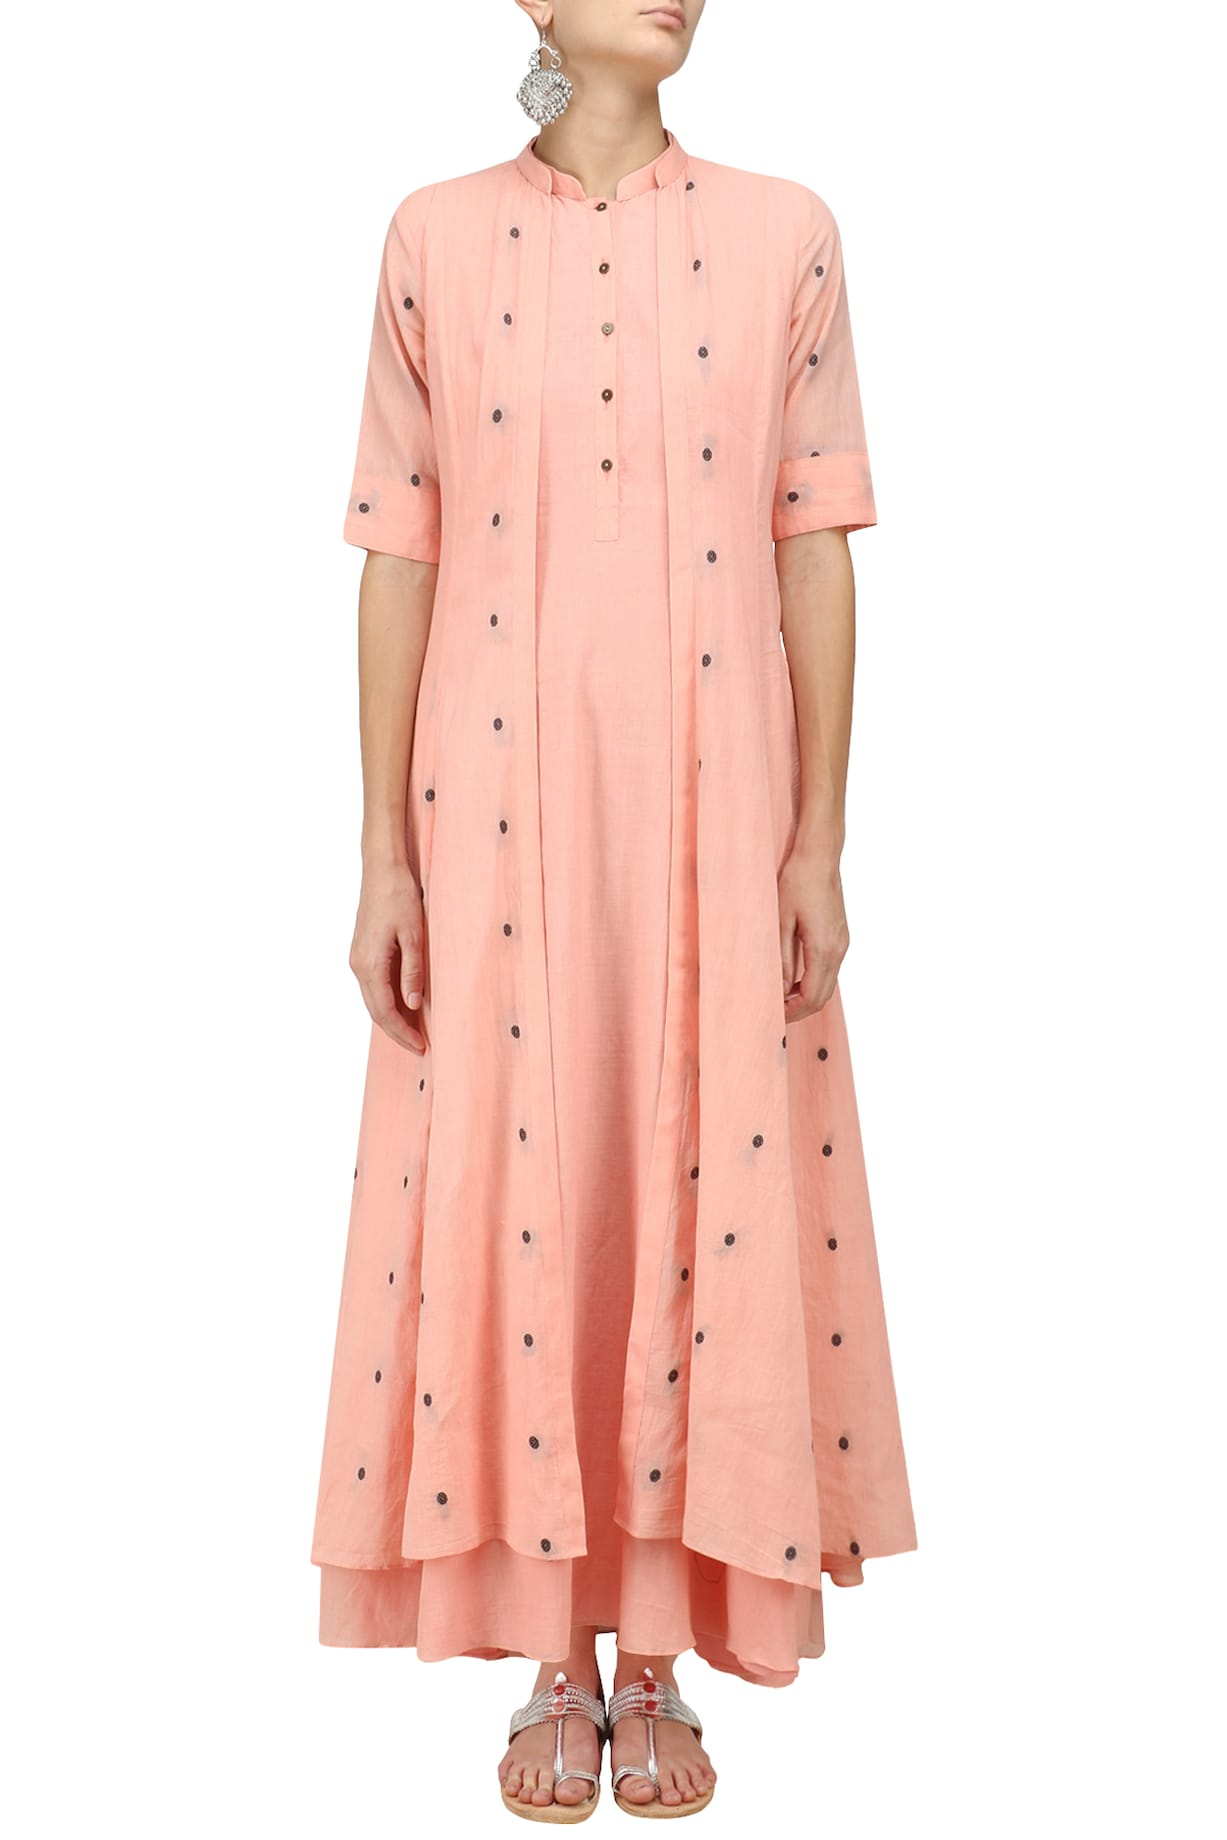 Myoho Dresses